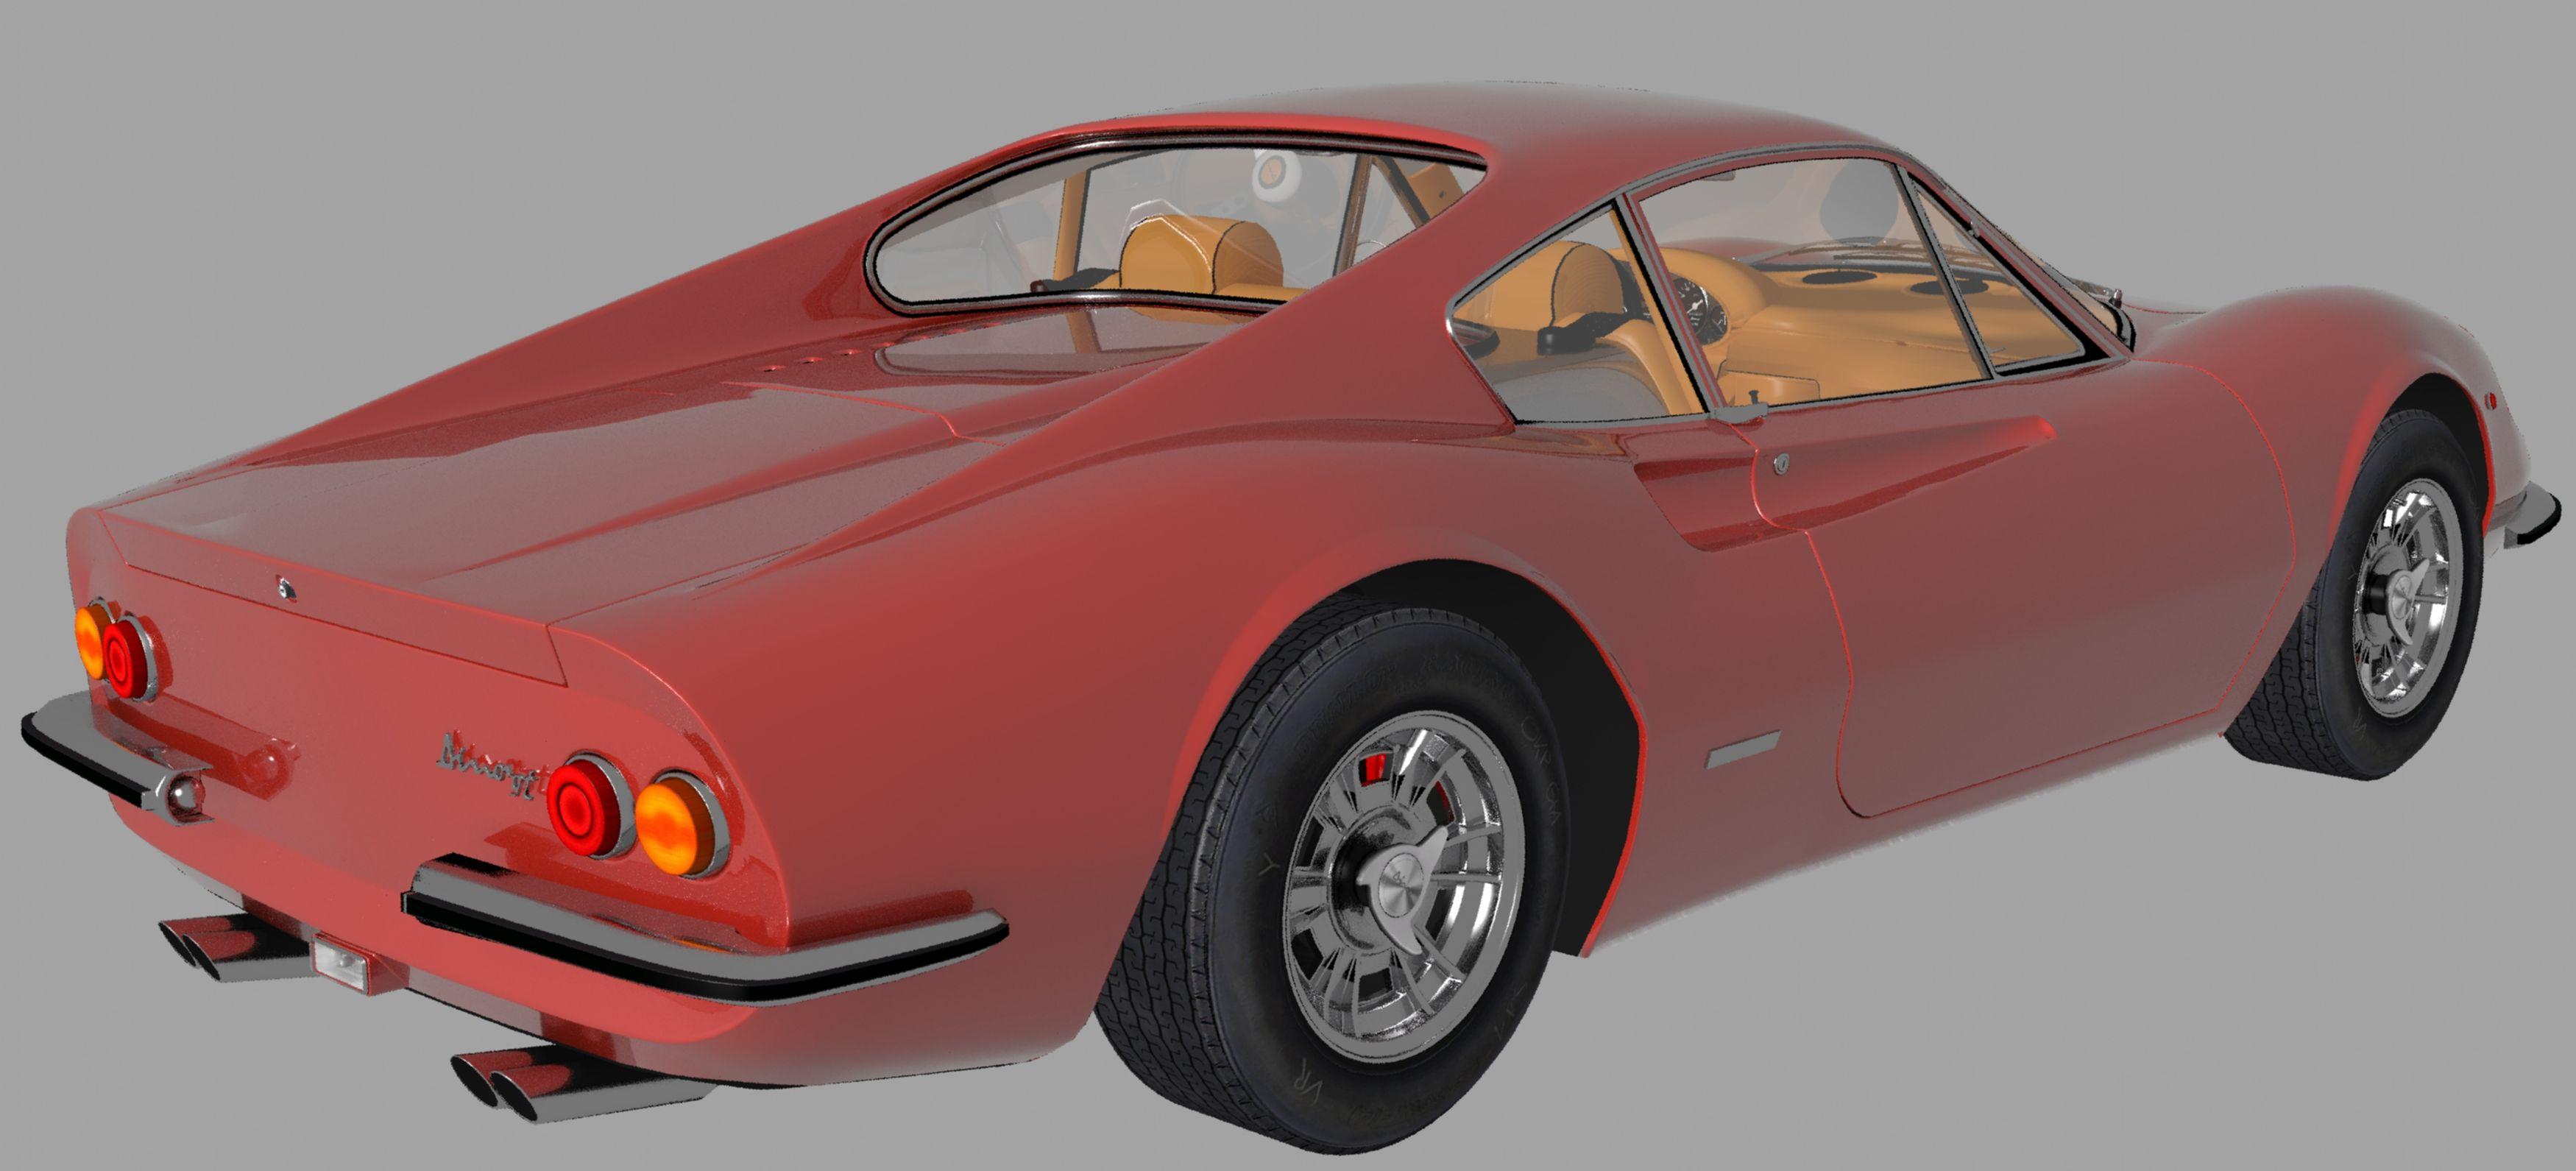 Ferrari-dino-246gt-4-3500-3500